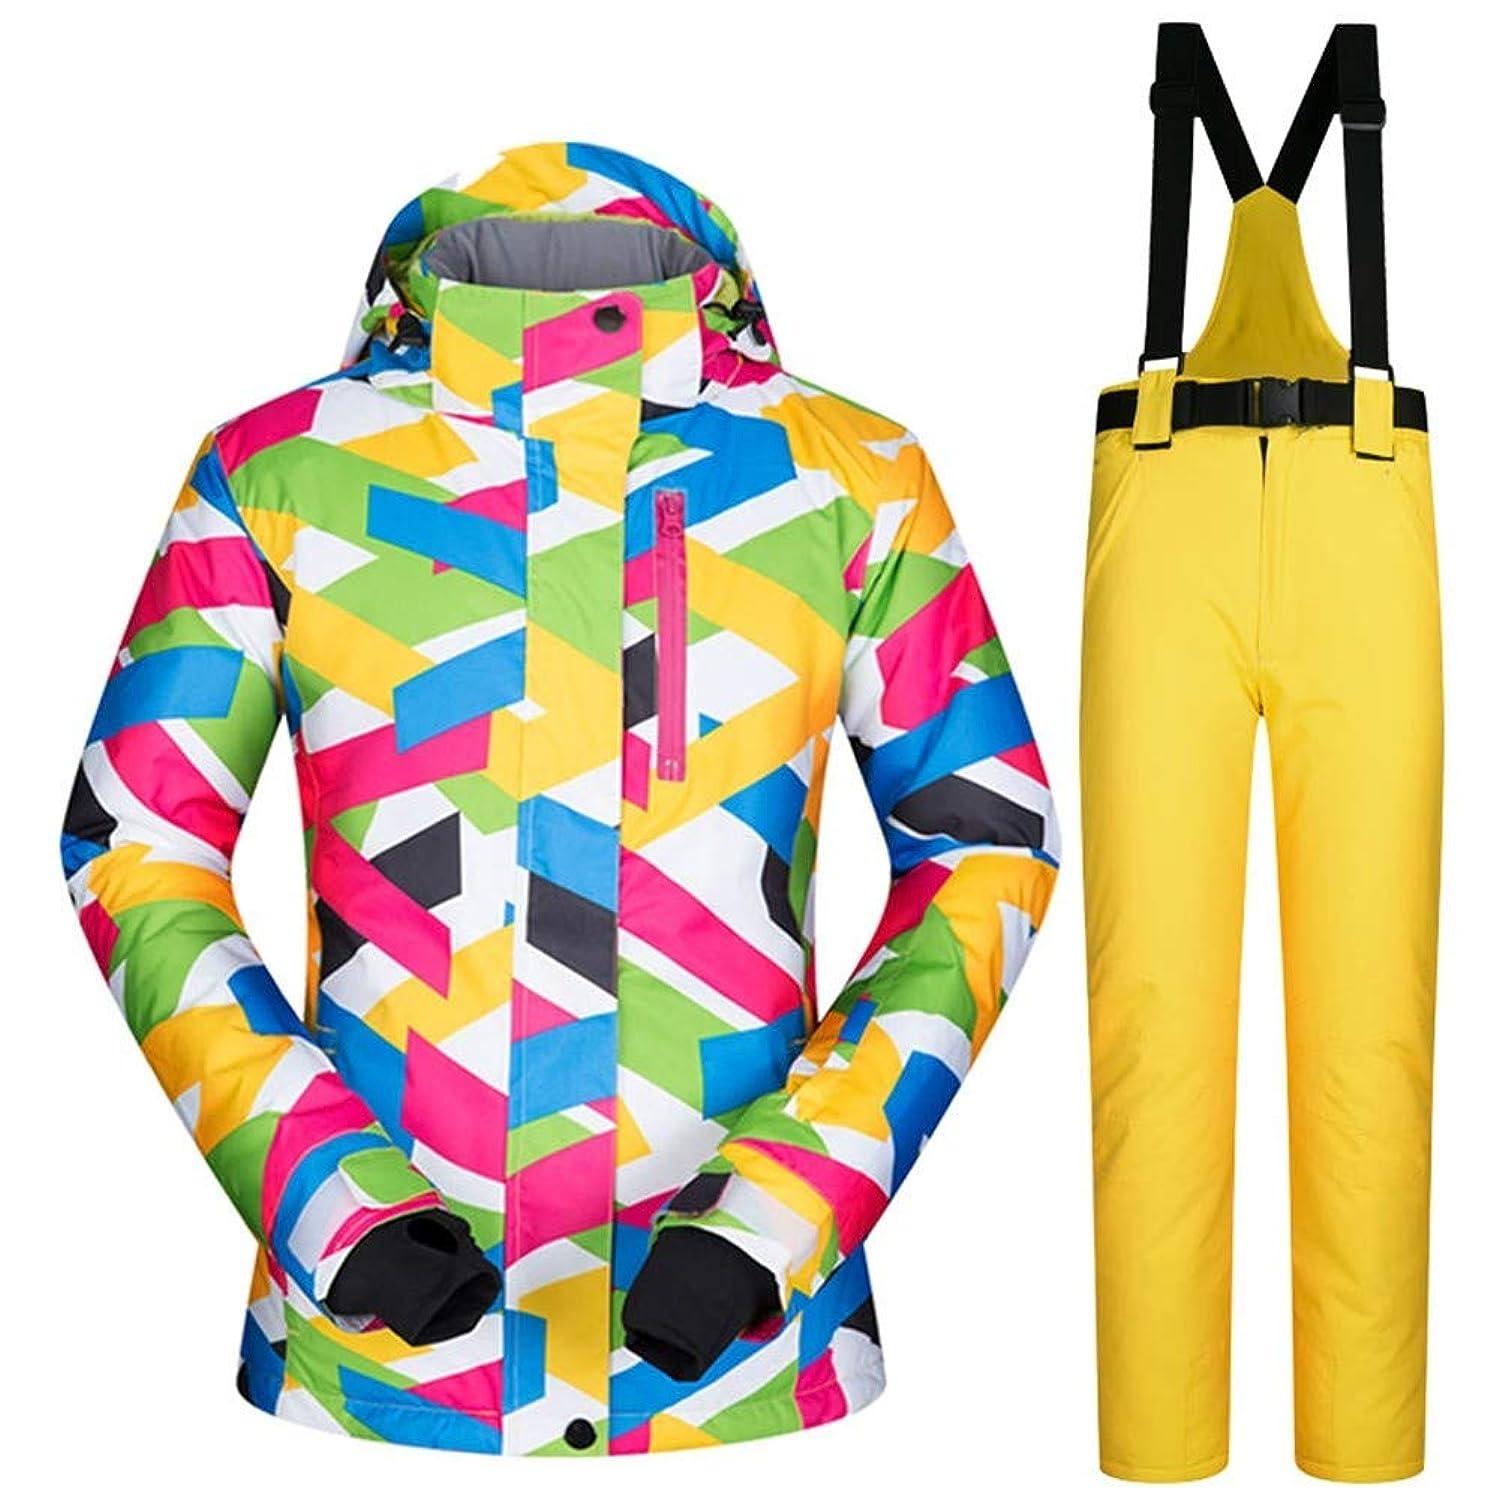 Teslaluv Ski Jacket Winter Ski Suit Women Ski Jacket and Pants Snow Warm Waterproof Windproof Skiing and Snowboarding Suits,S